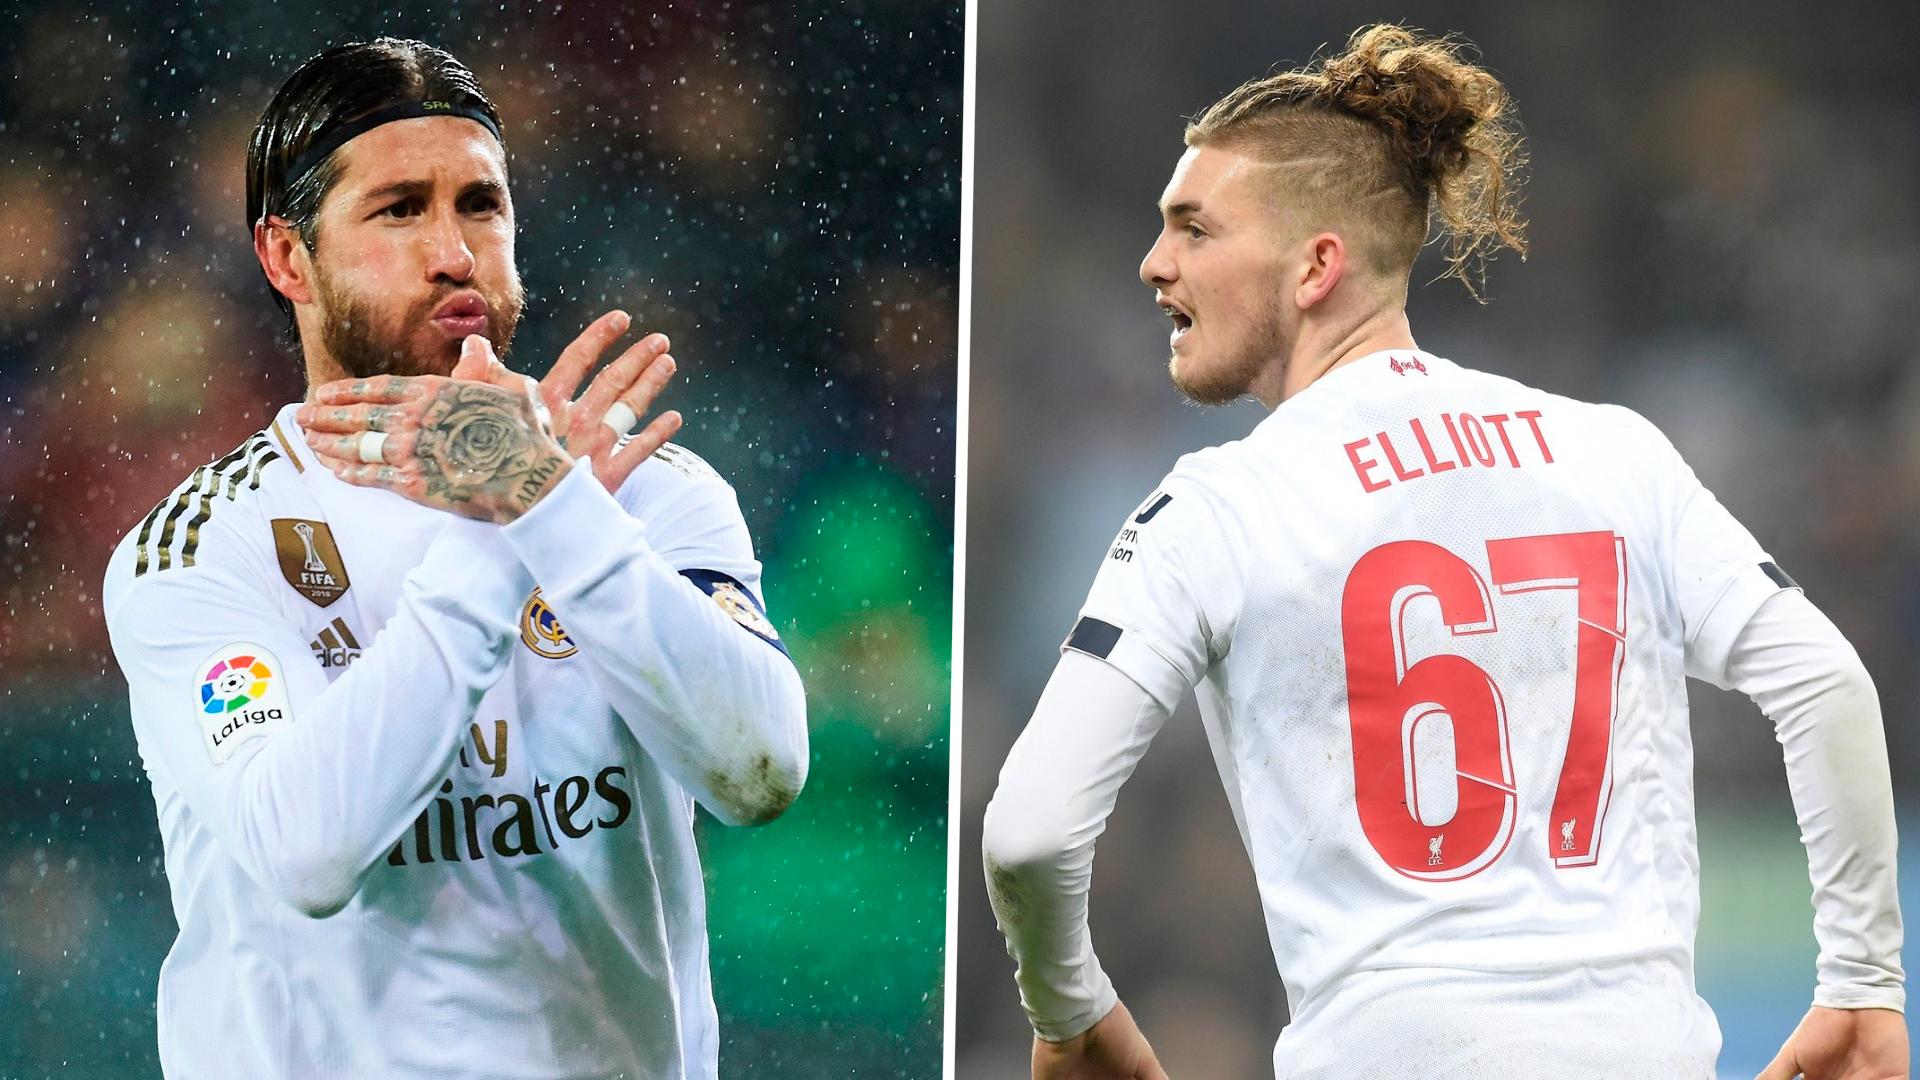 'I don't like him' - Liverpool wonderkid Elliott snubs Real captain Ramos